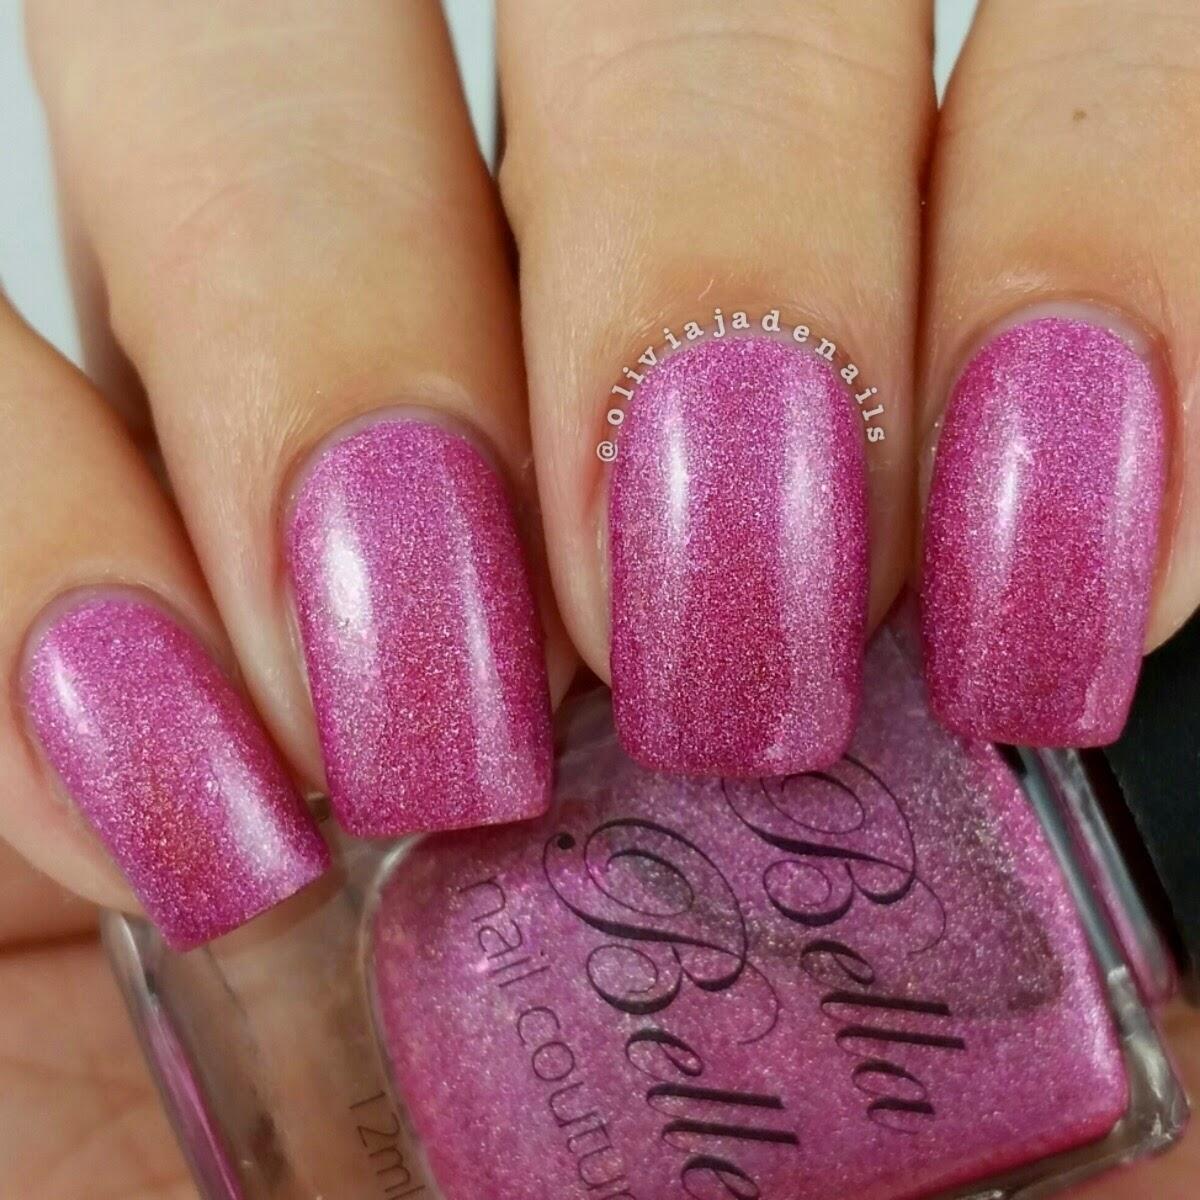 Olivia Jade Nails: Bella Belle Nail Couture Bridal Collection ...